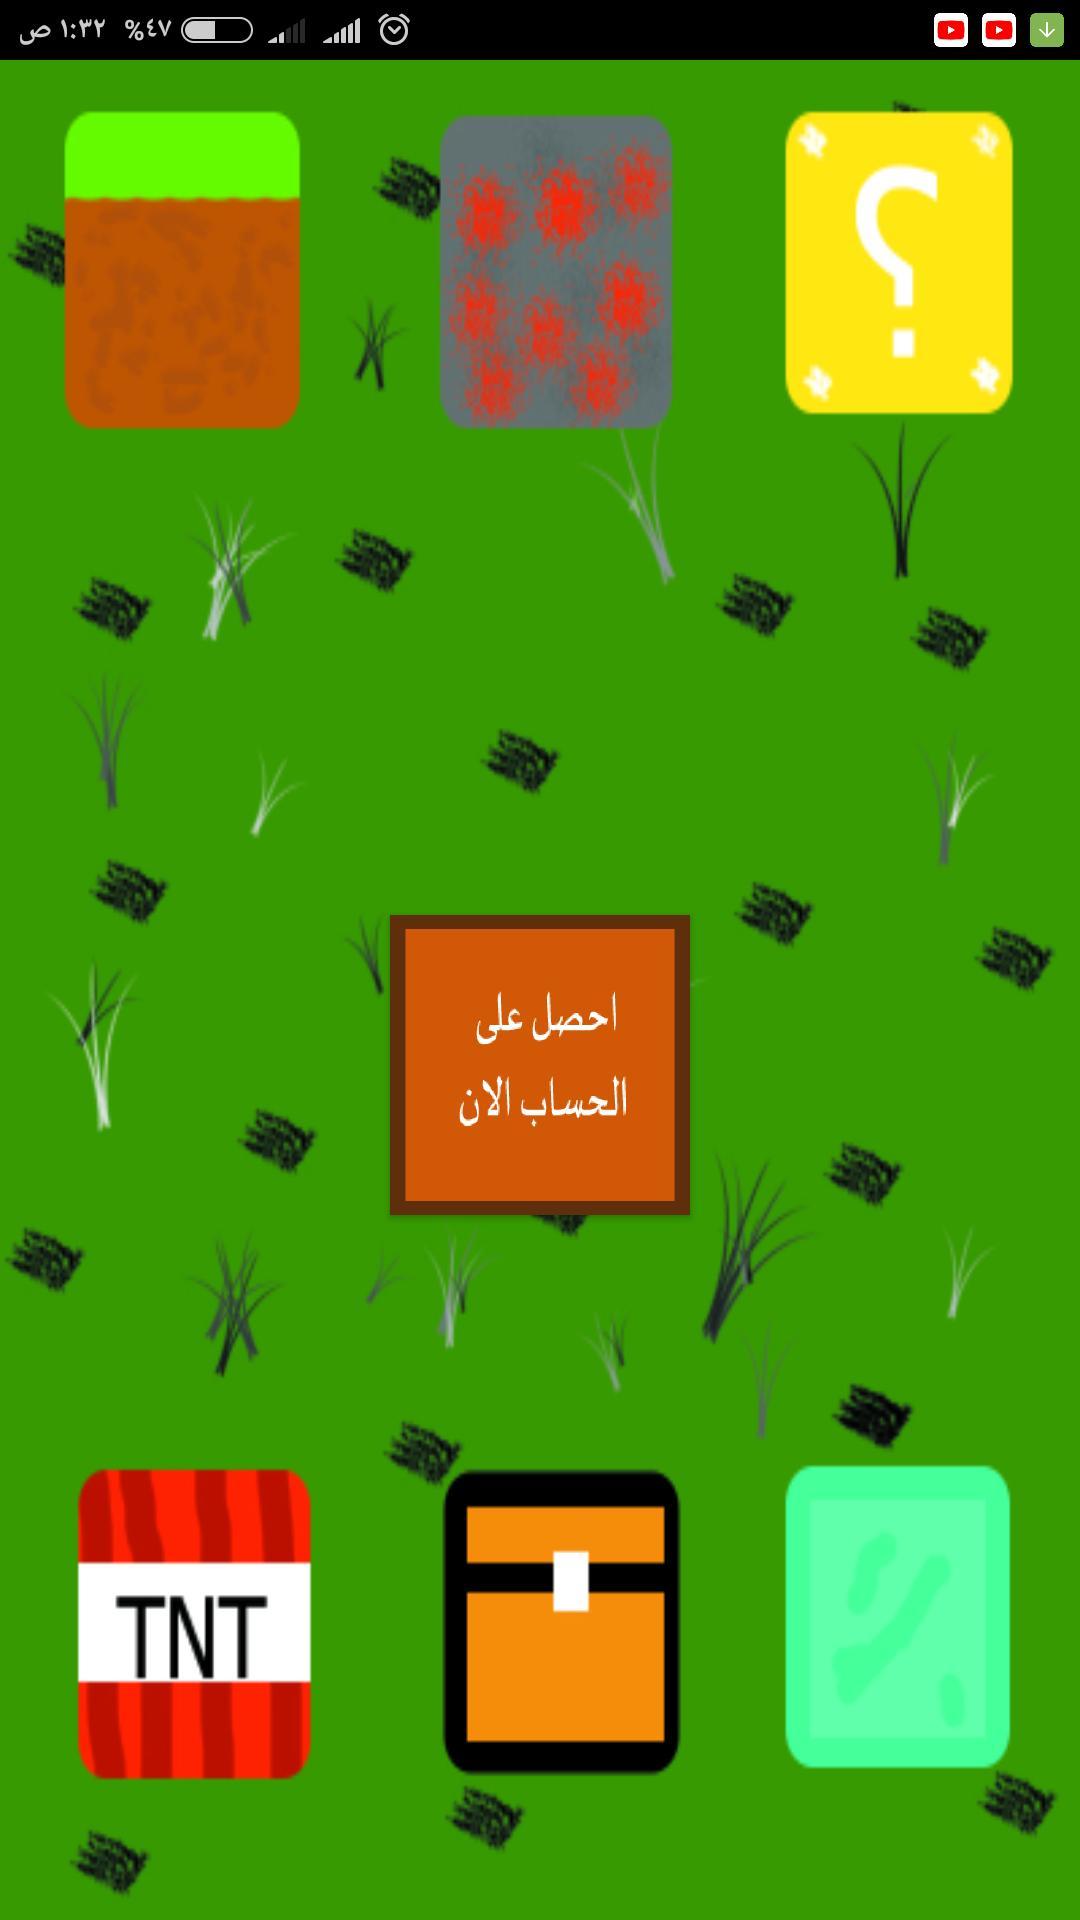 حسابات ماين كرافت اصلية مجانا For Android Apk Download